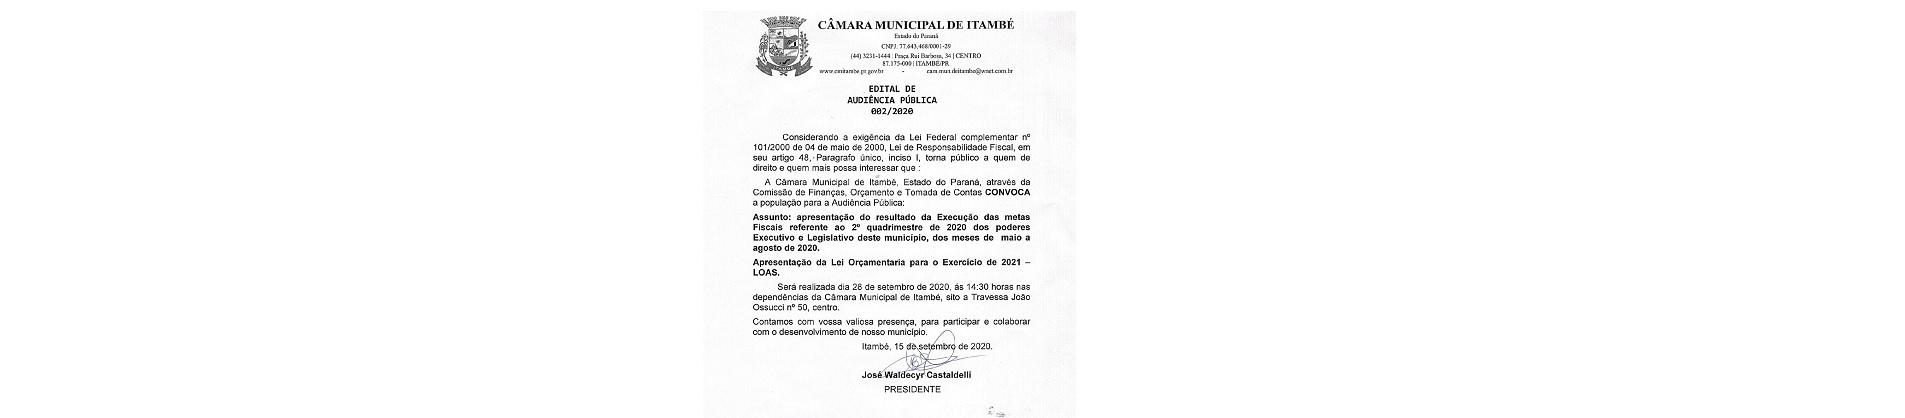 EDITAL DE AUDIÊNCIA PUBLICA DO 2º QUADRIMESTRE DE 2020